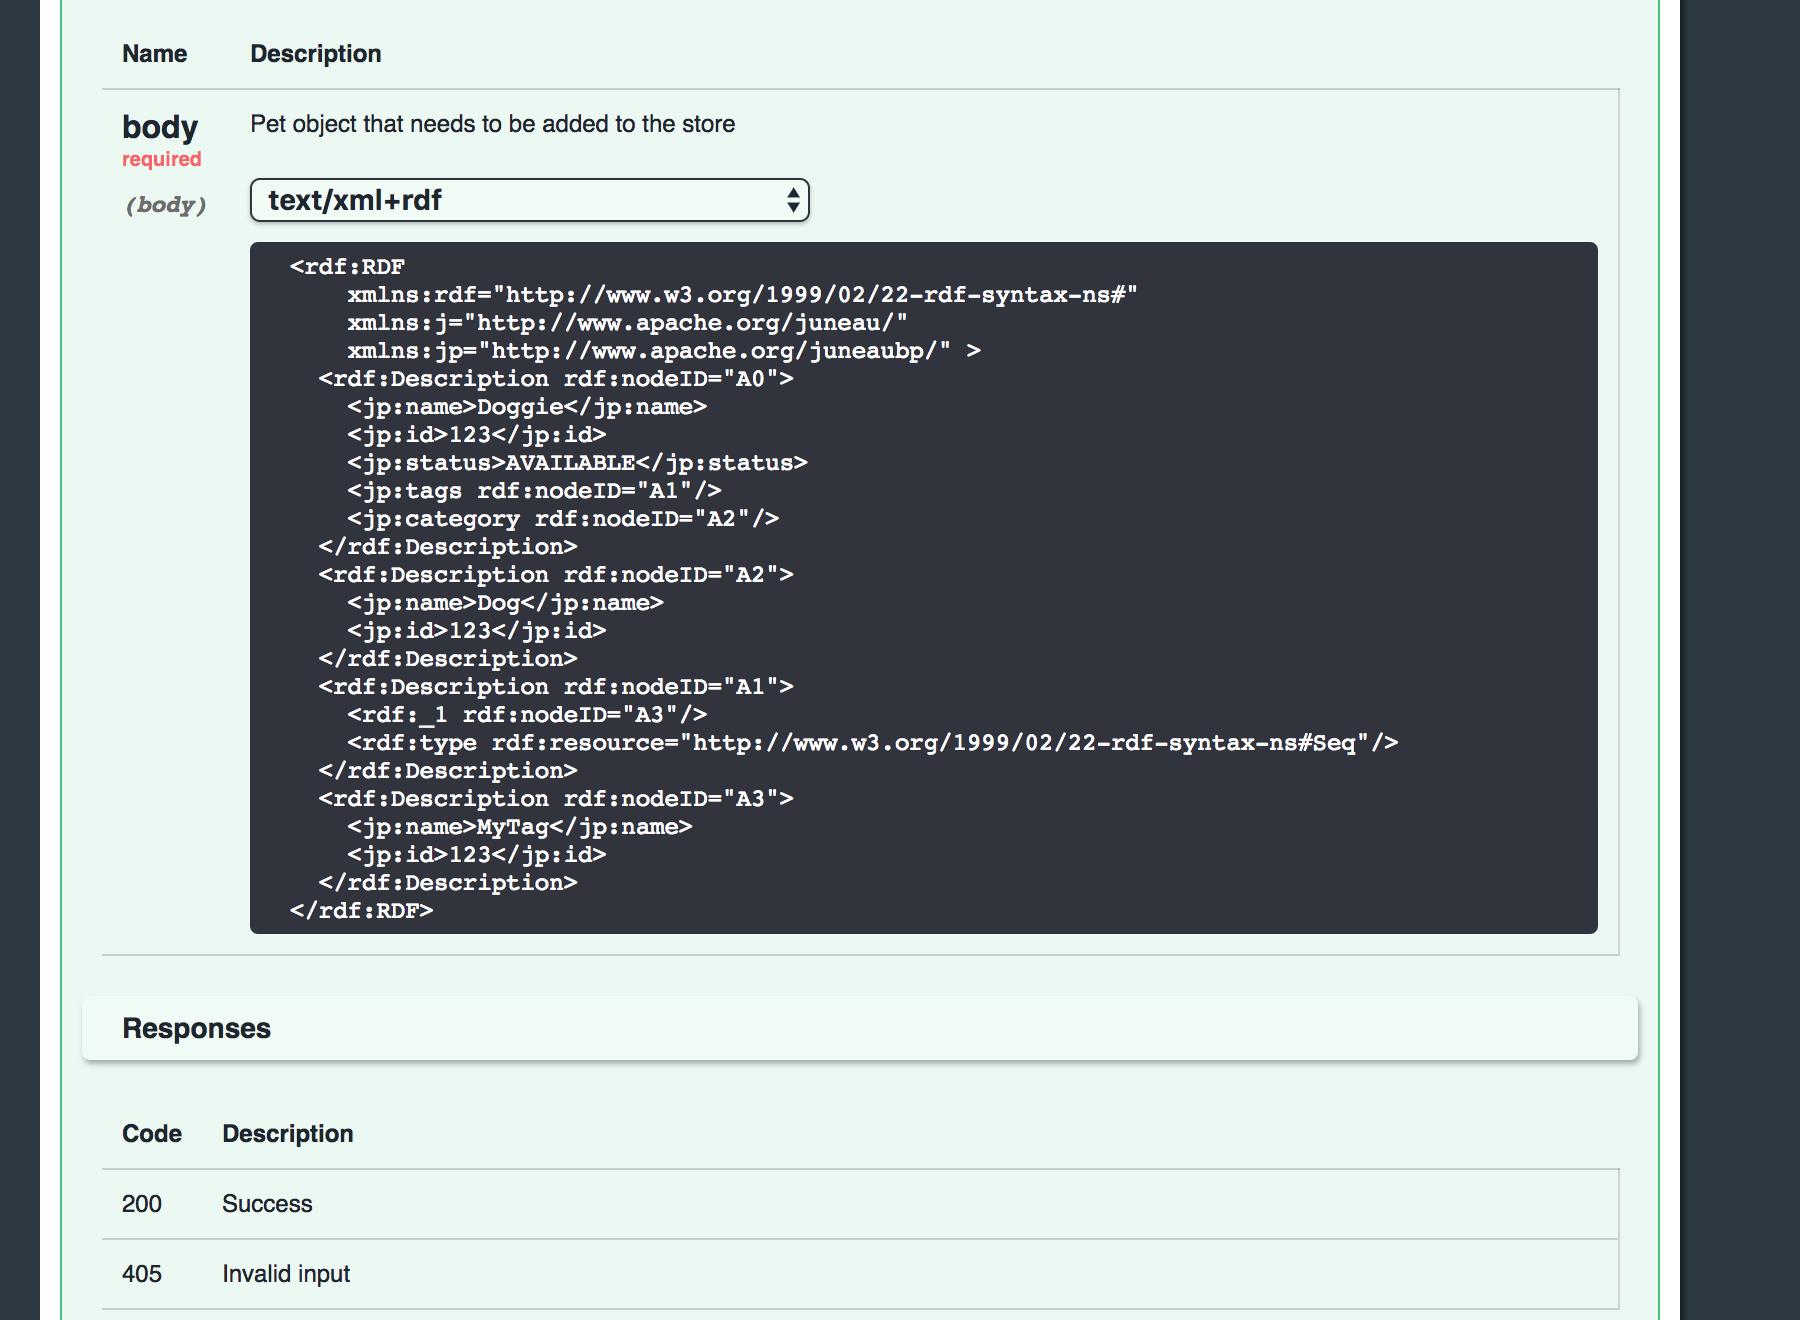 Swagger UI enhancements (update) - Juneau - Apache Software